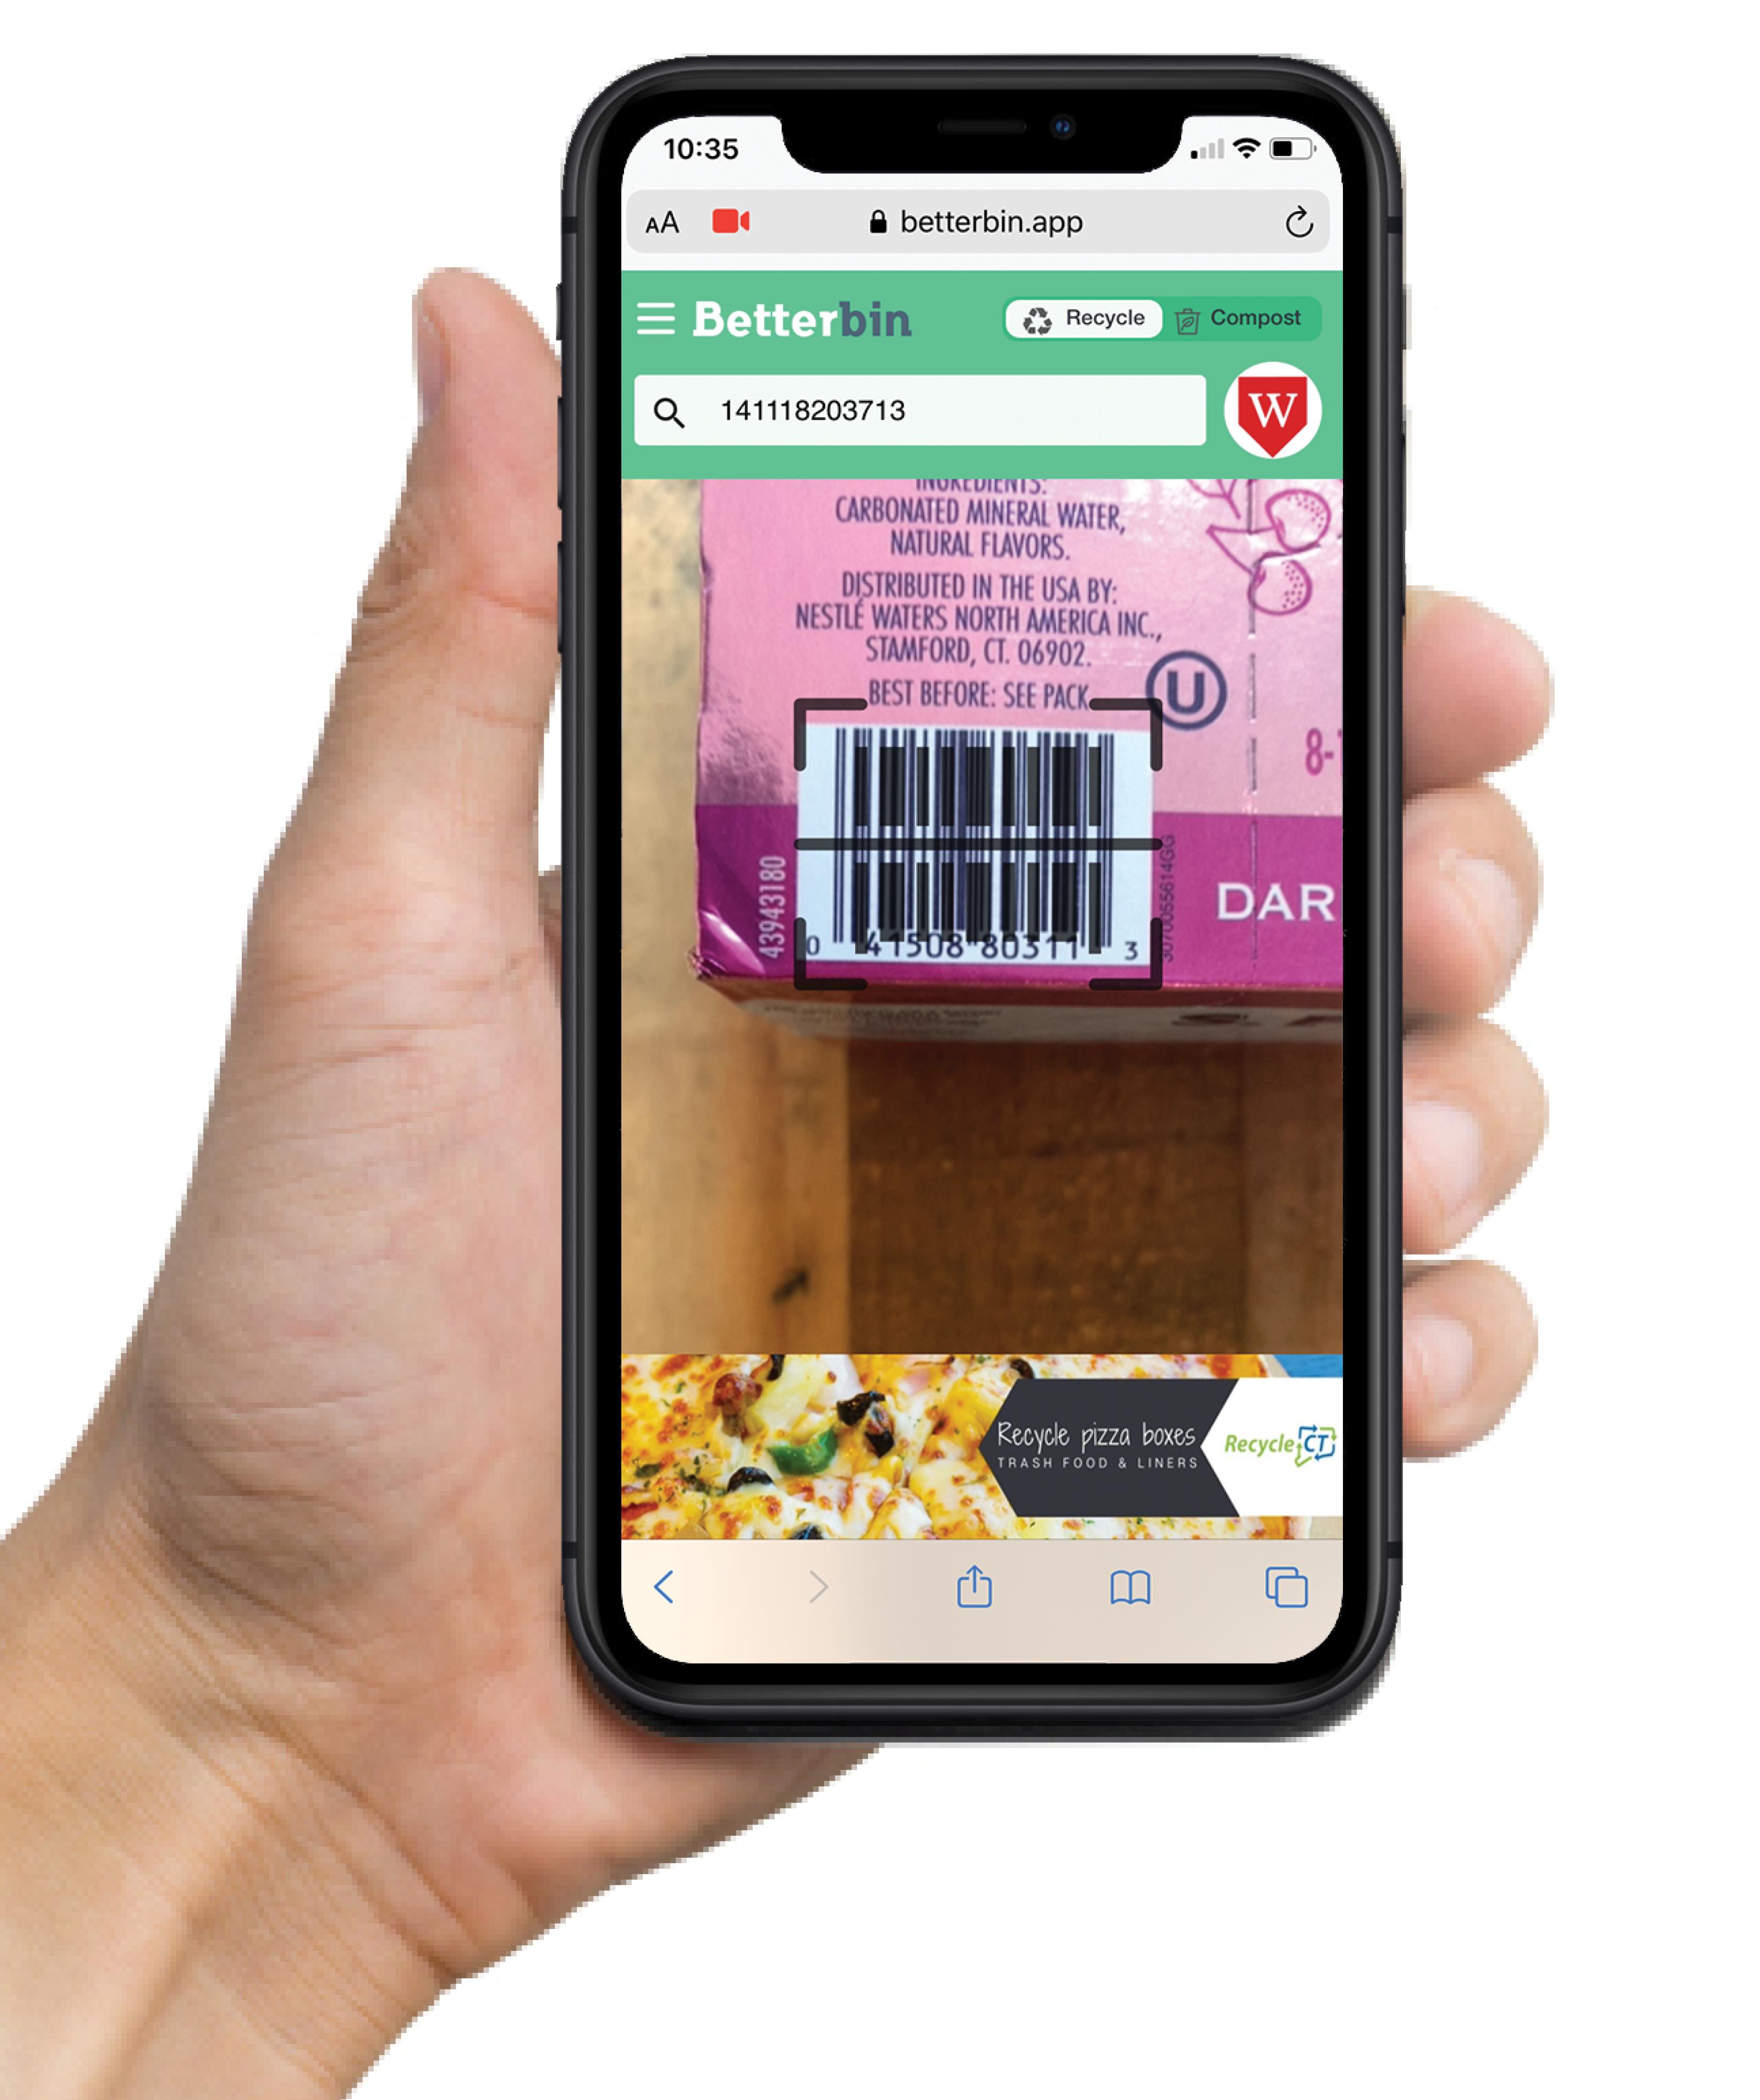 Betterbin app barcode scan function